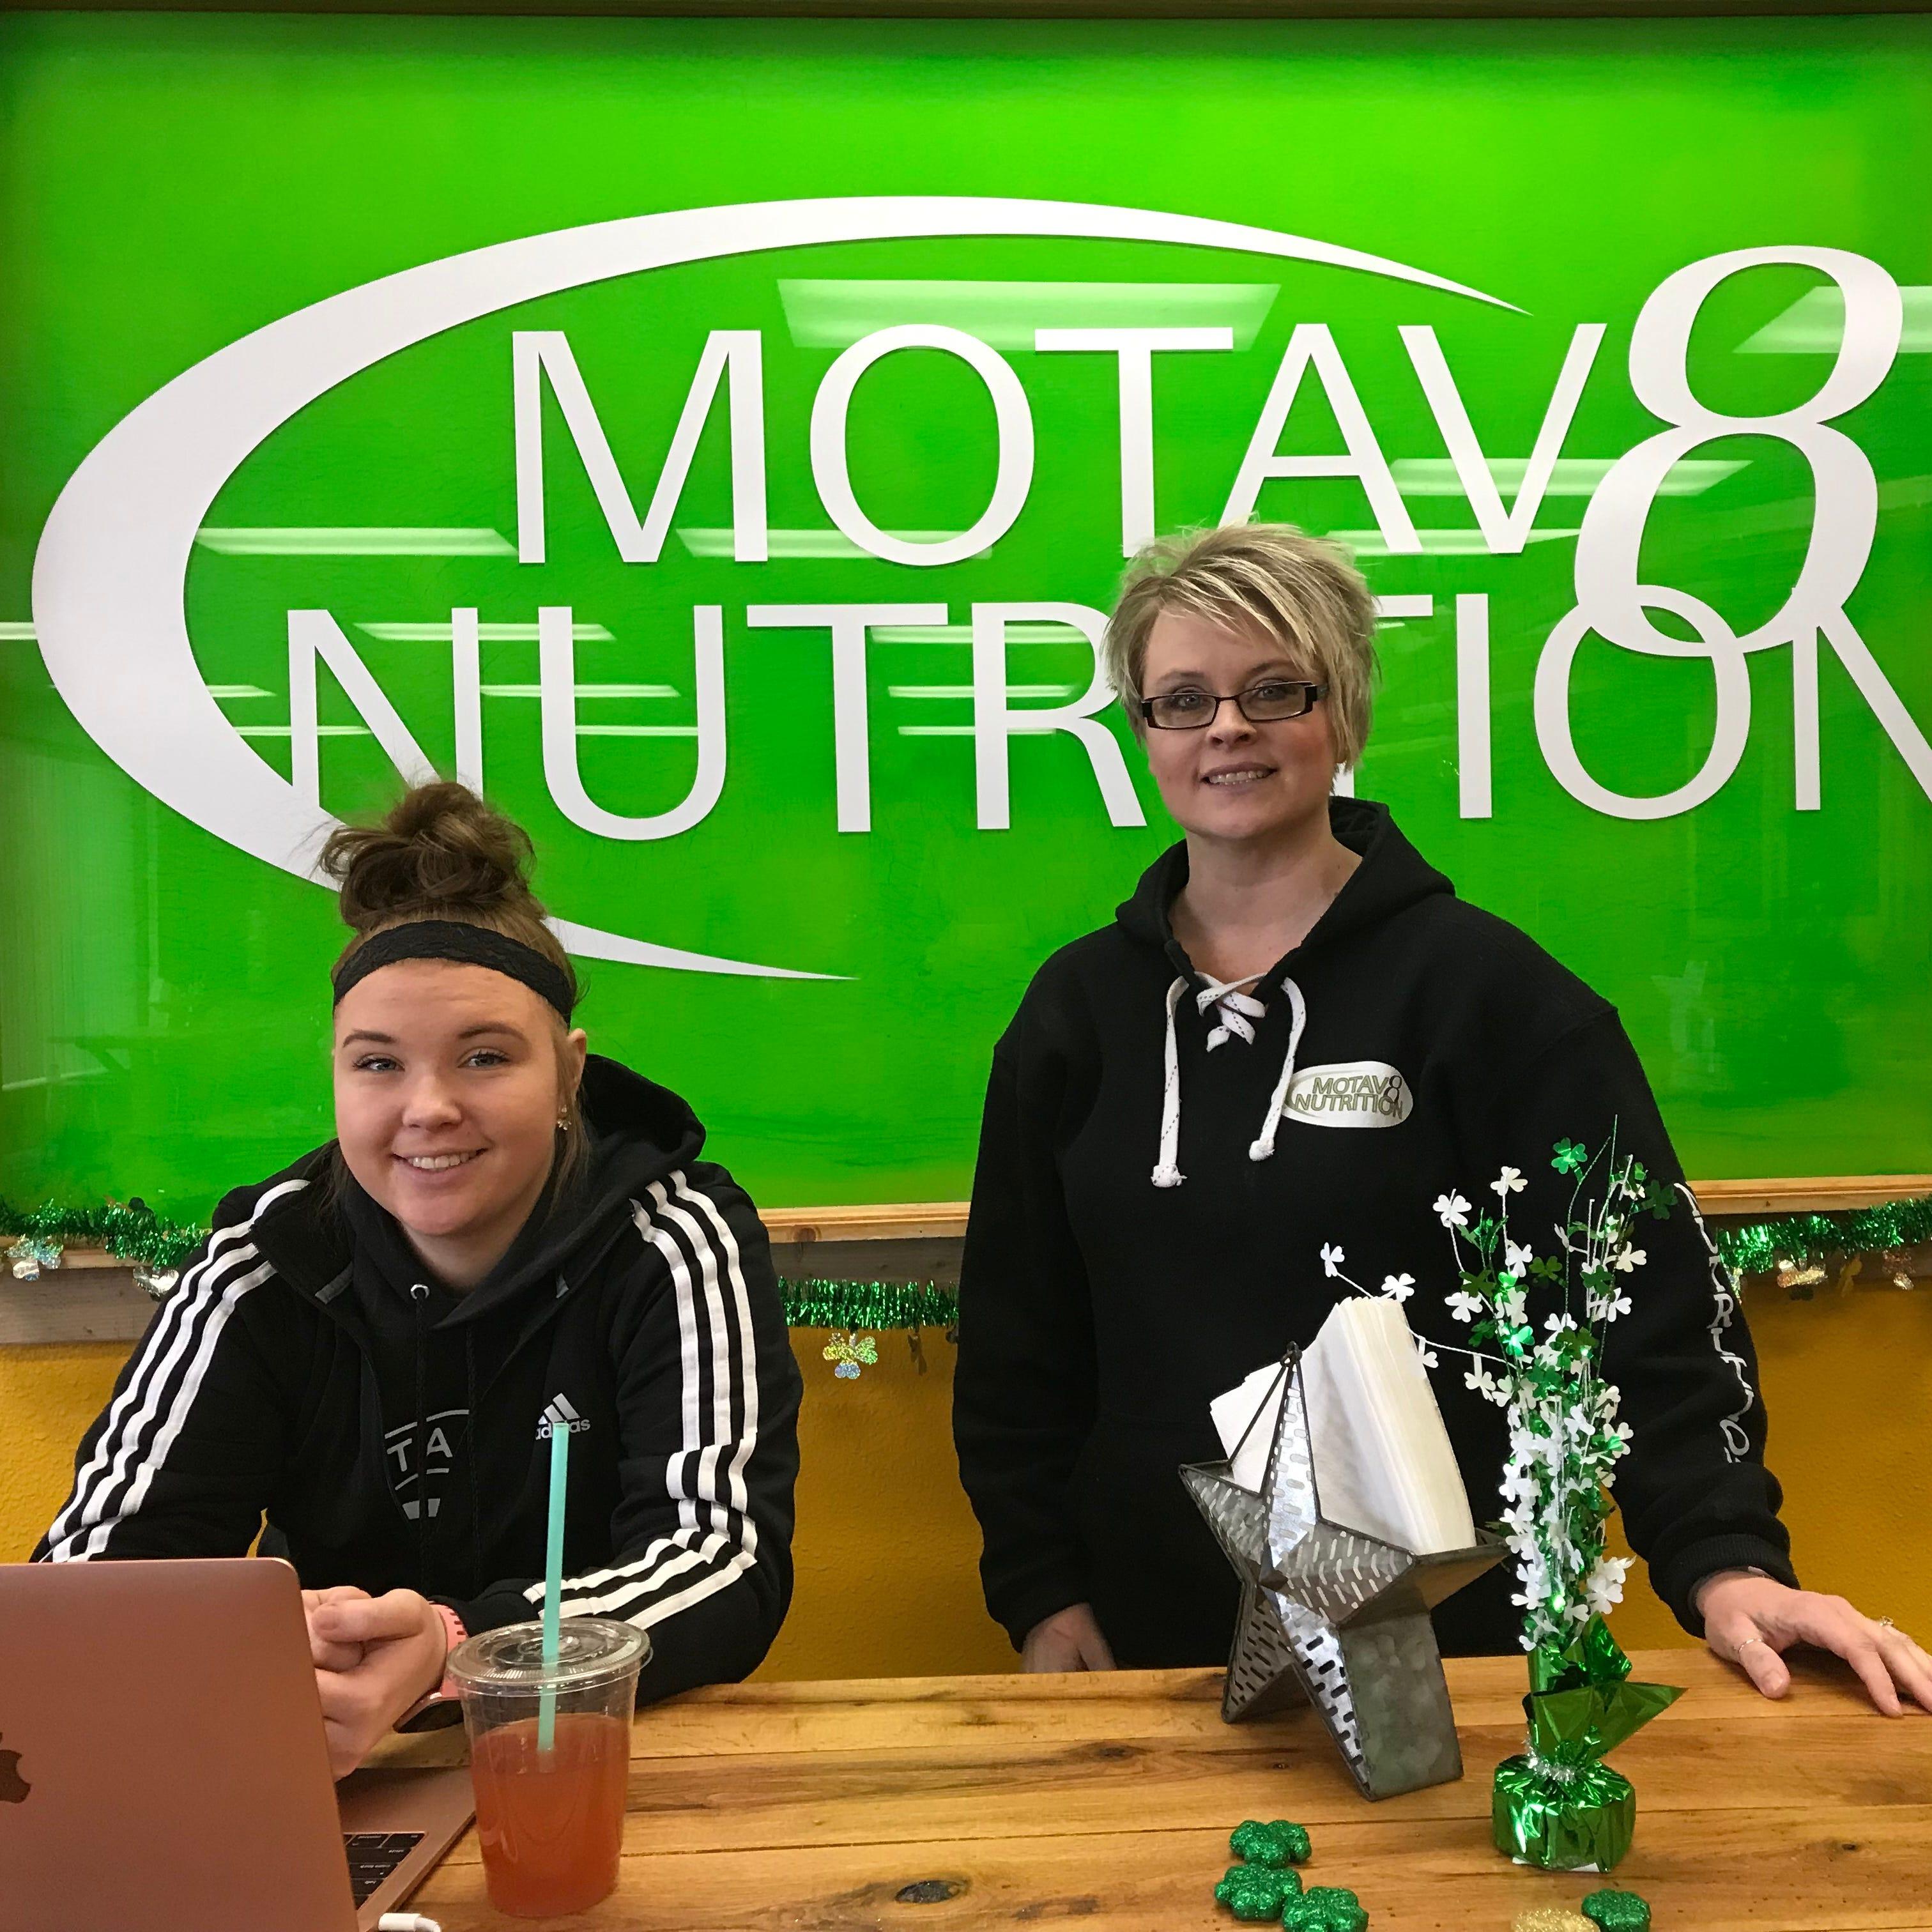 Motav8 Nutrition offers 33 shake flavors, tea, coffee in Wisconsin Rapids